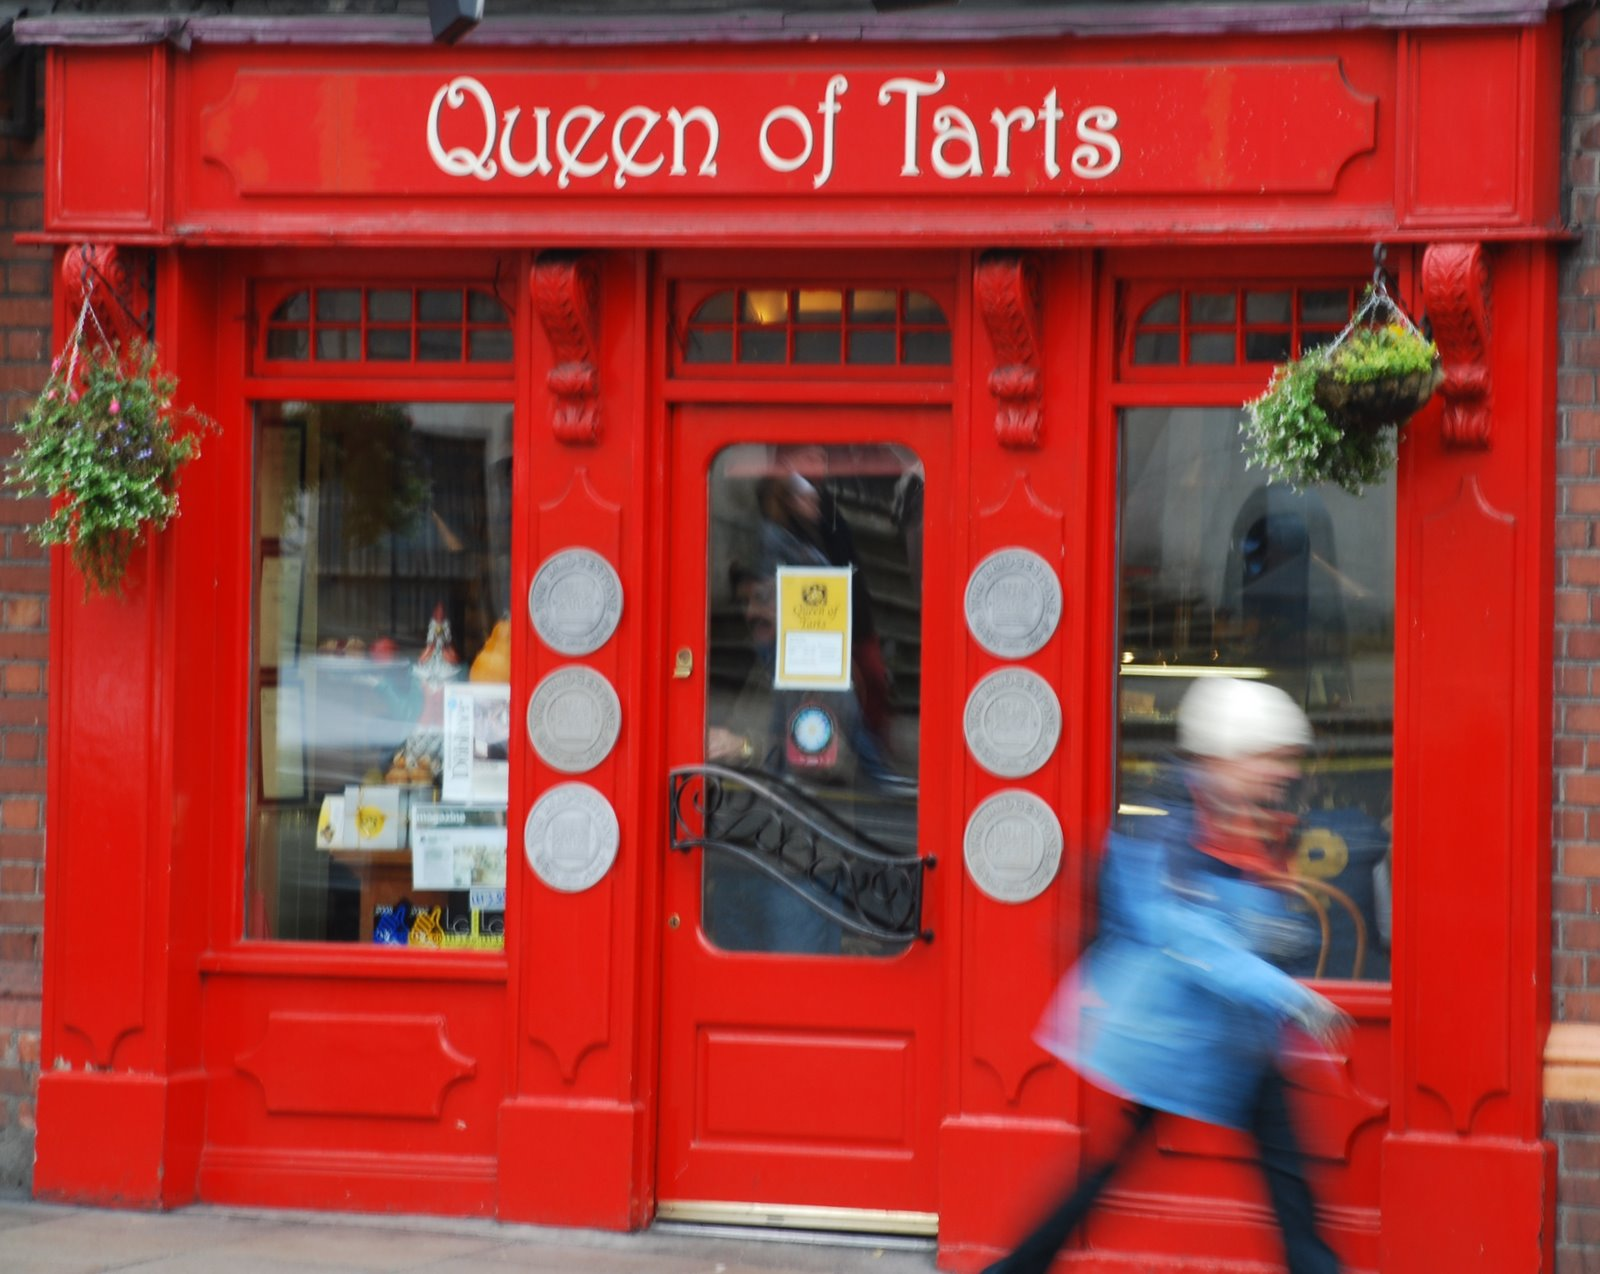 Travel Sweet Sweet On The Queen Of Tarts In Dublin Ireland